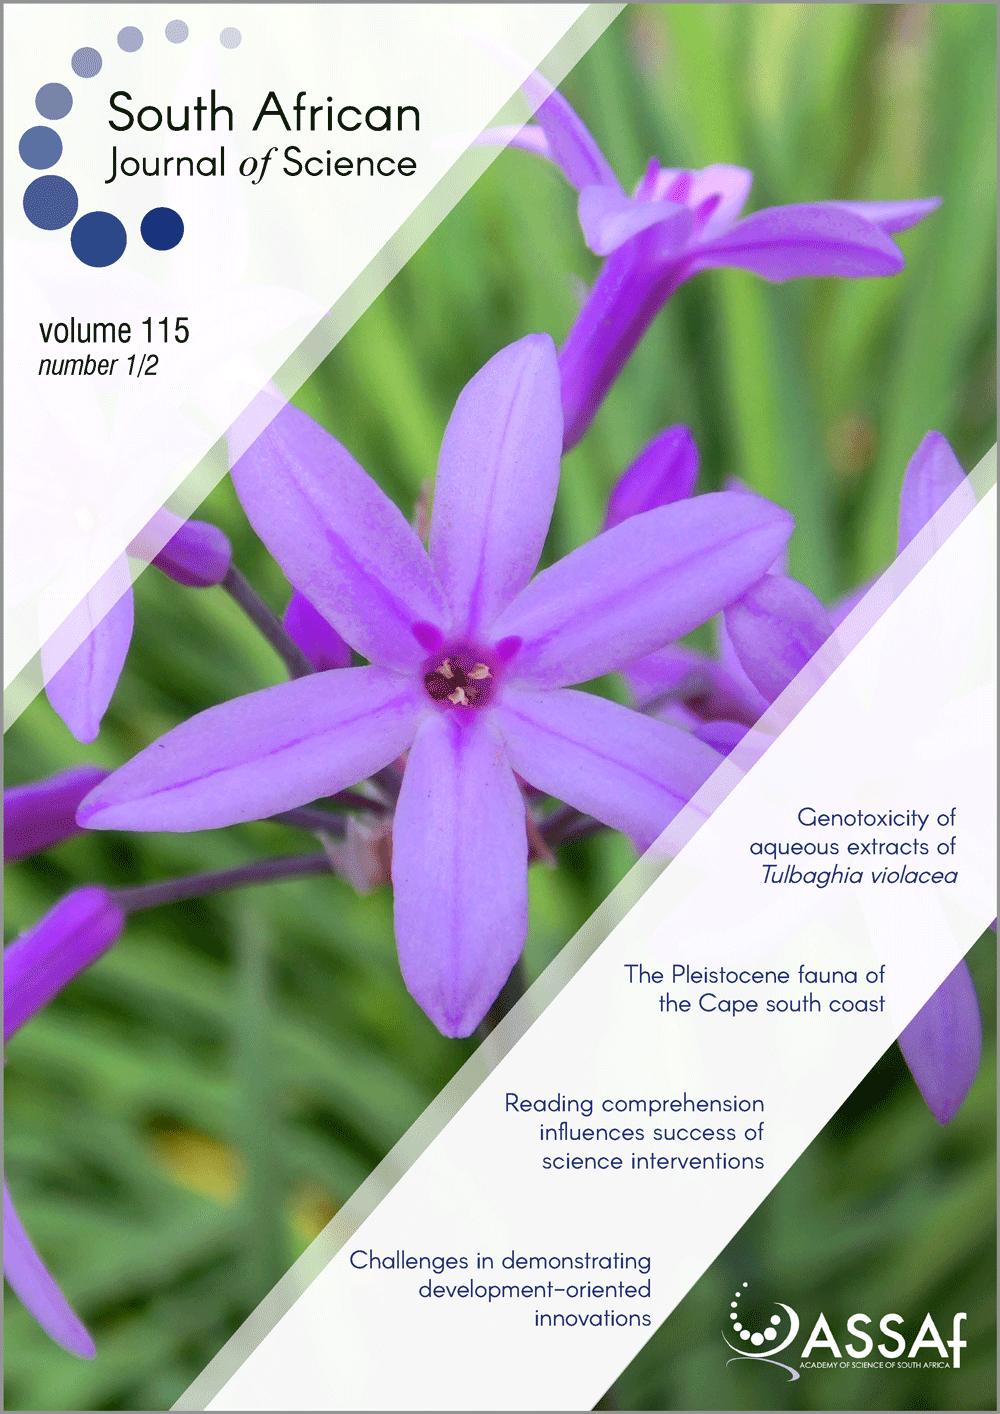 View Vol. 115 No. 1/2 (2019)